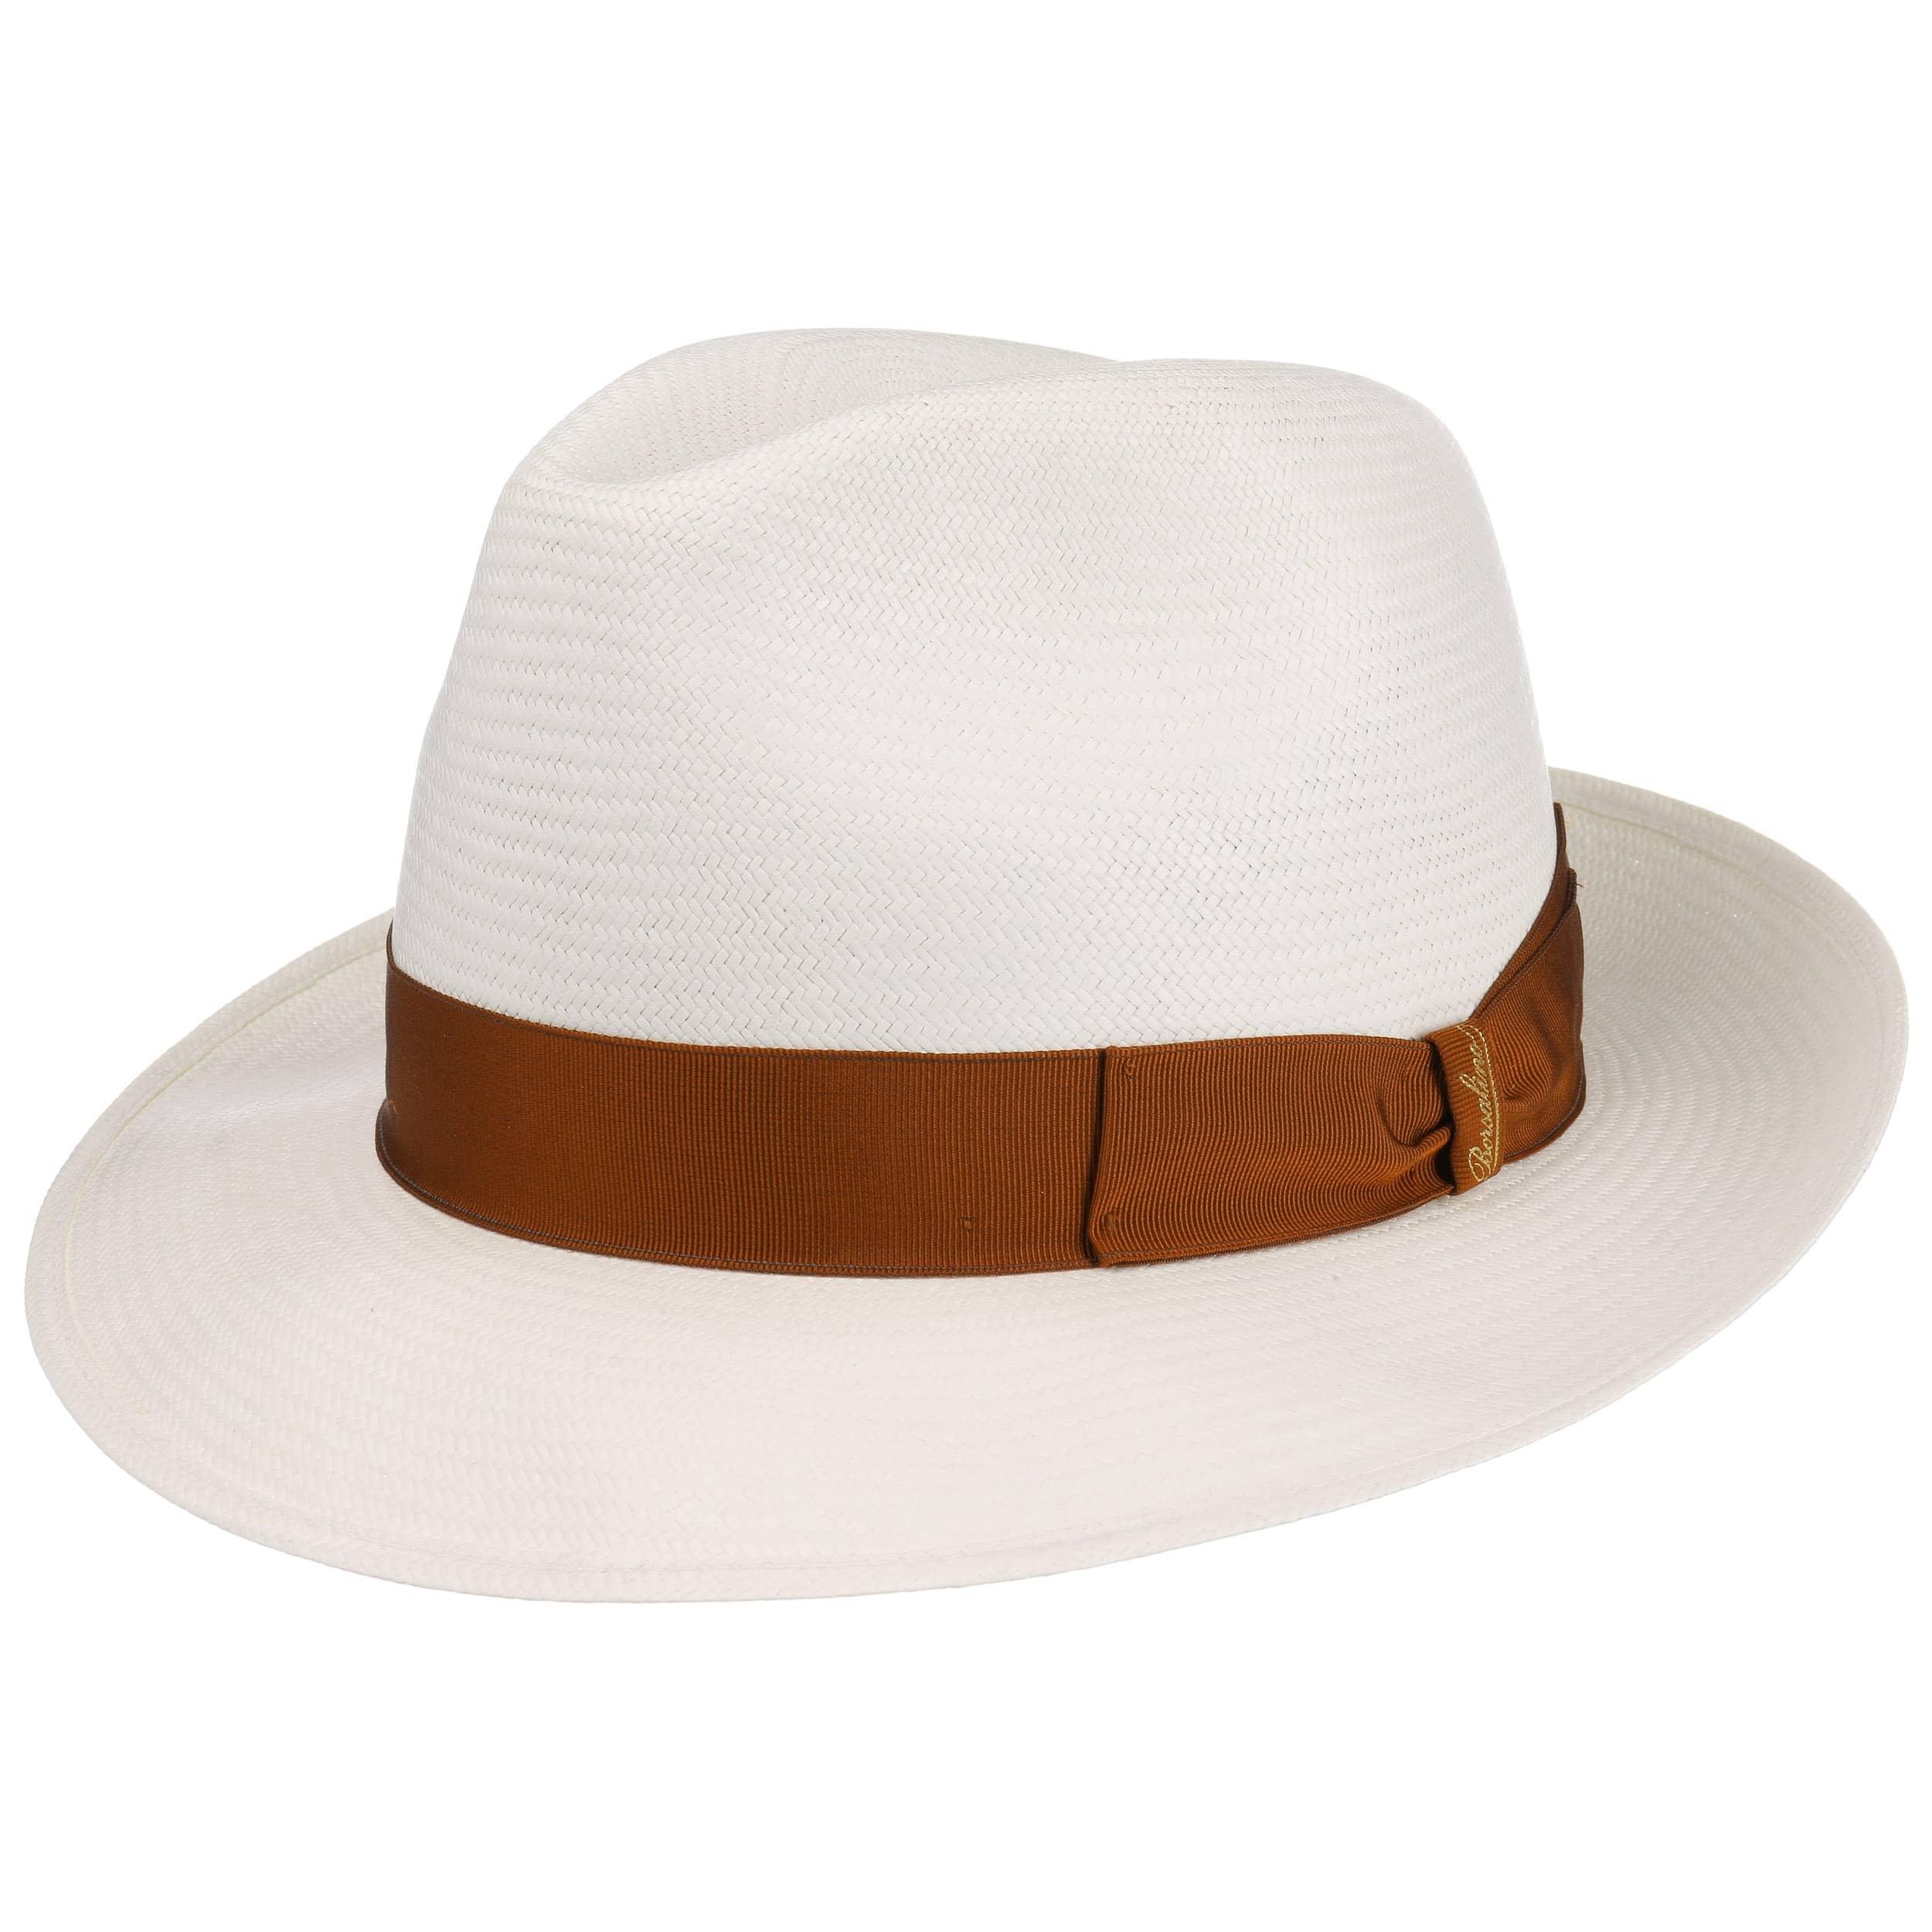 ... Borsalino 2 · Cappello Panama Brown Small by Borsalino - natura 4 ... 73687e02fe66